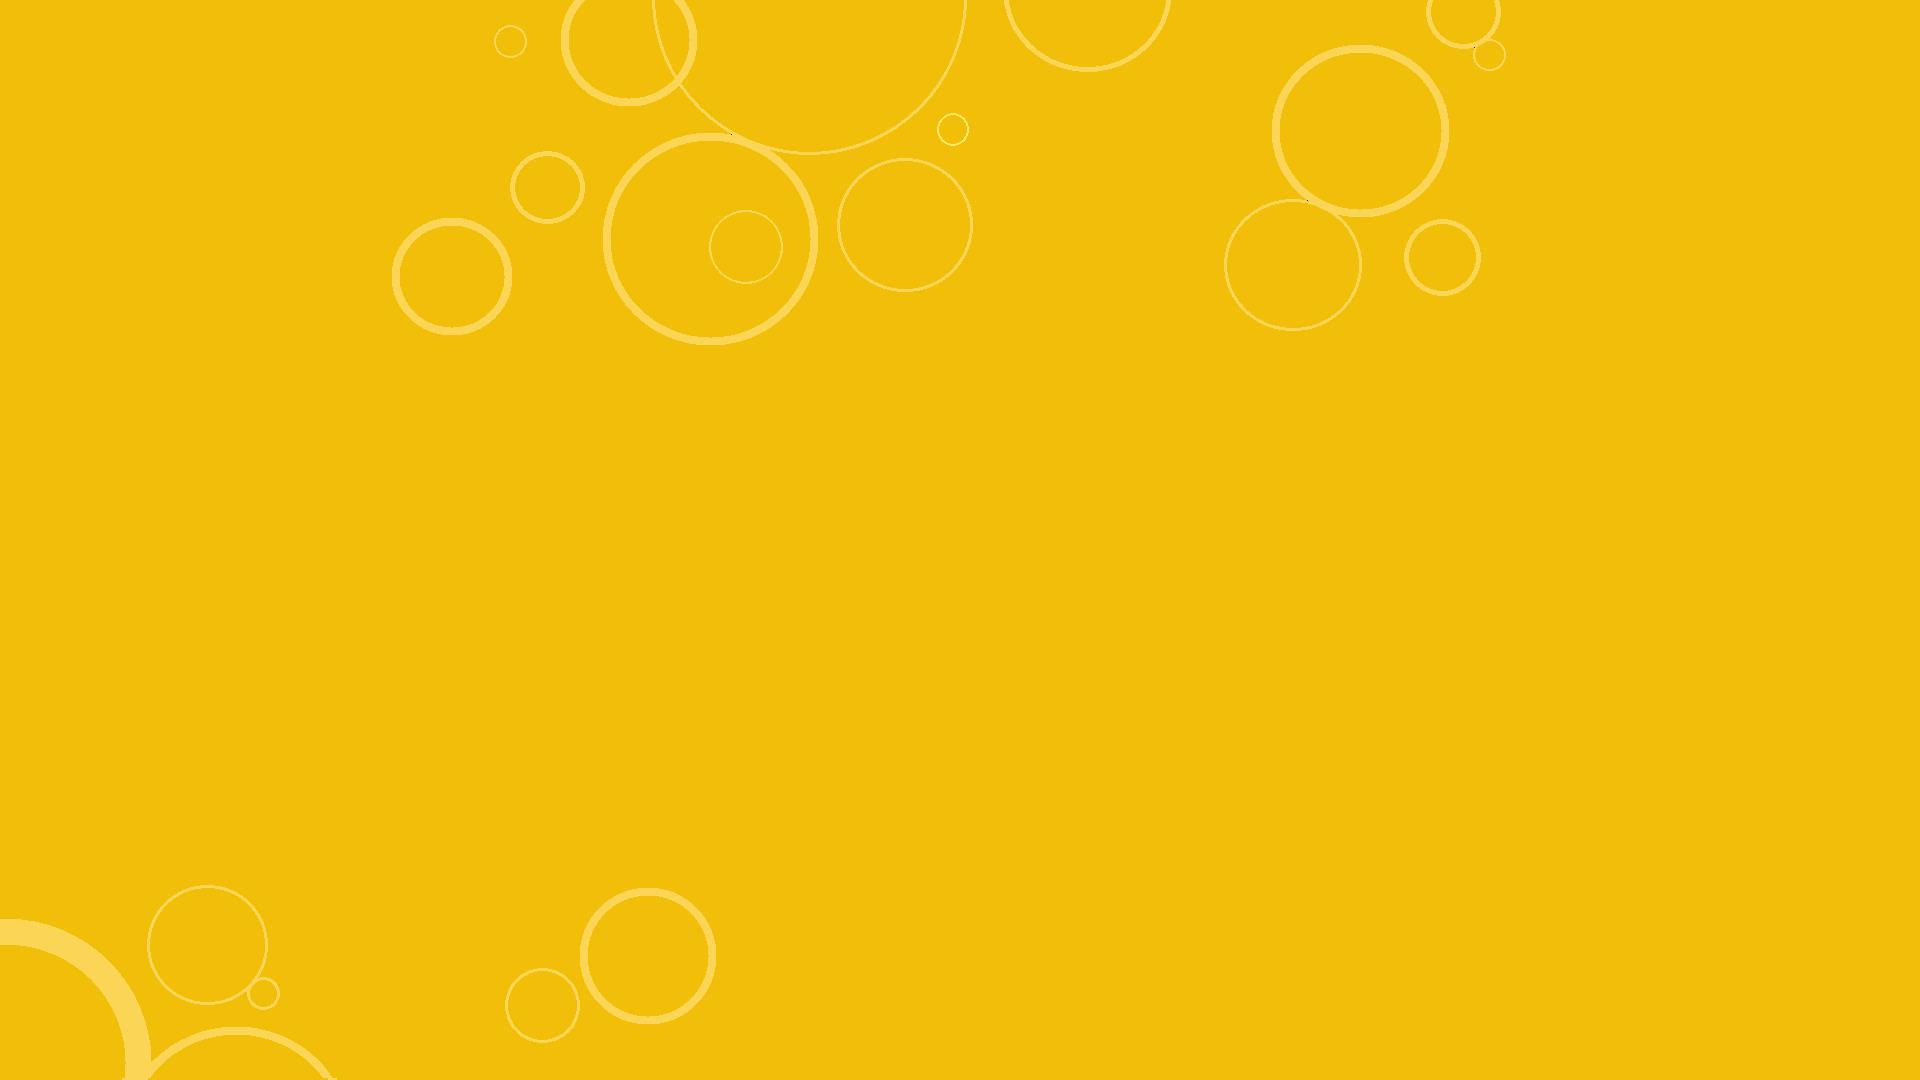 free yellow background 43937